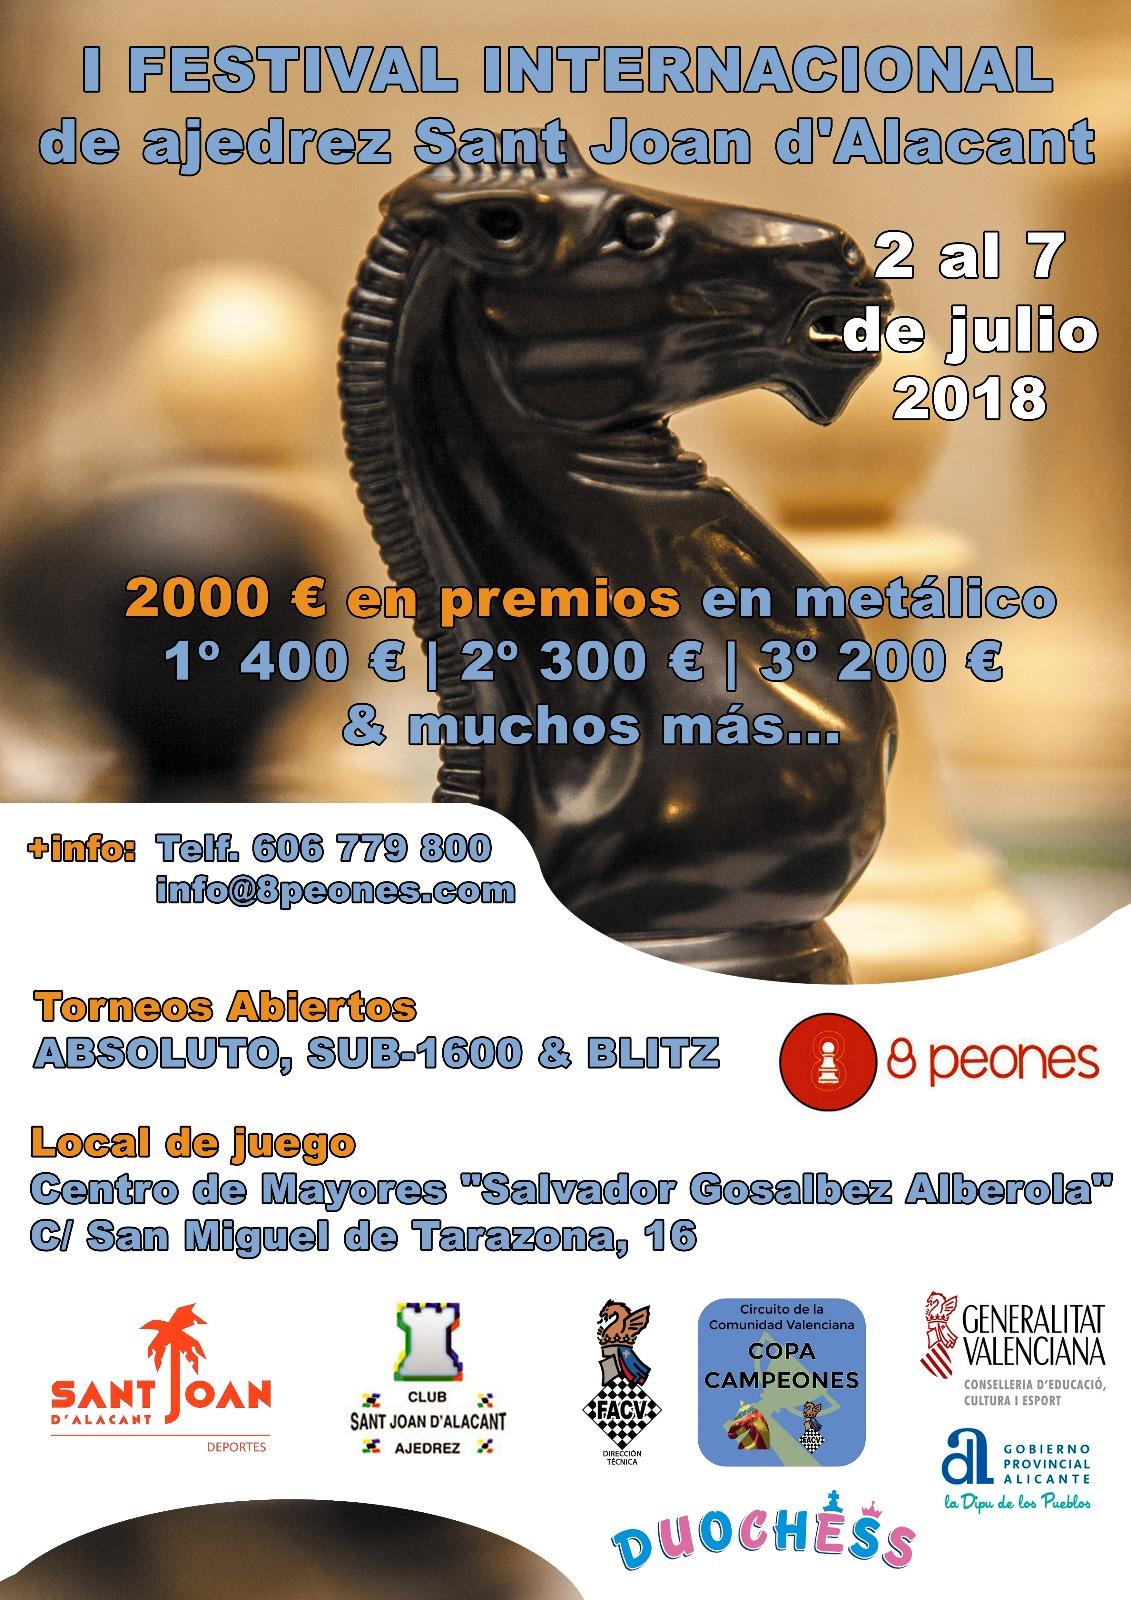 I Festival Internacional Sant Joan d'Alacant